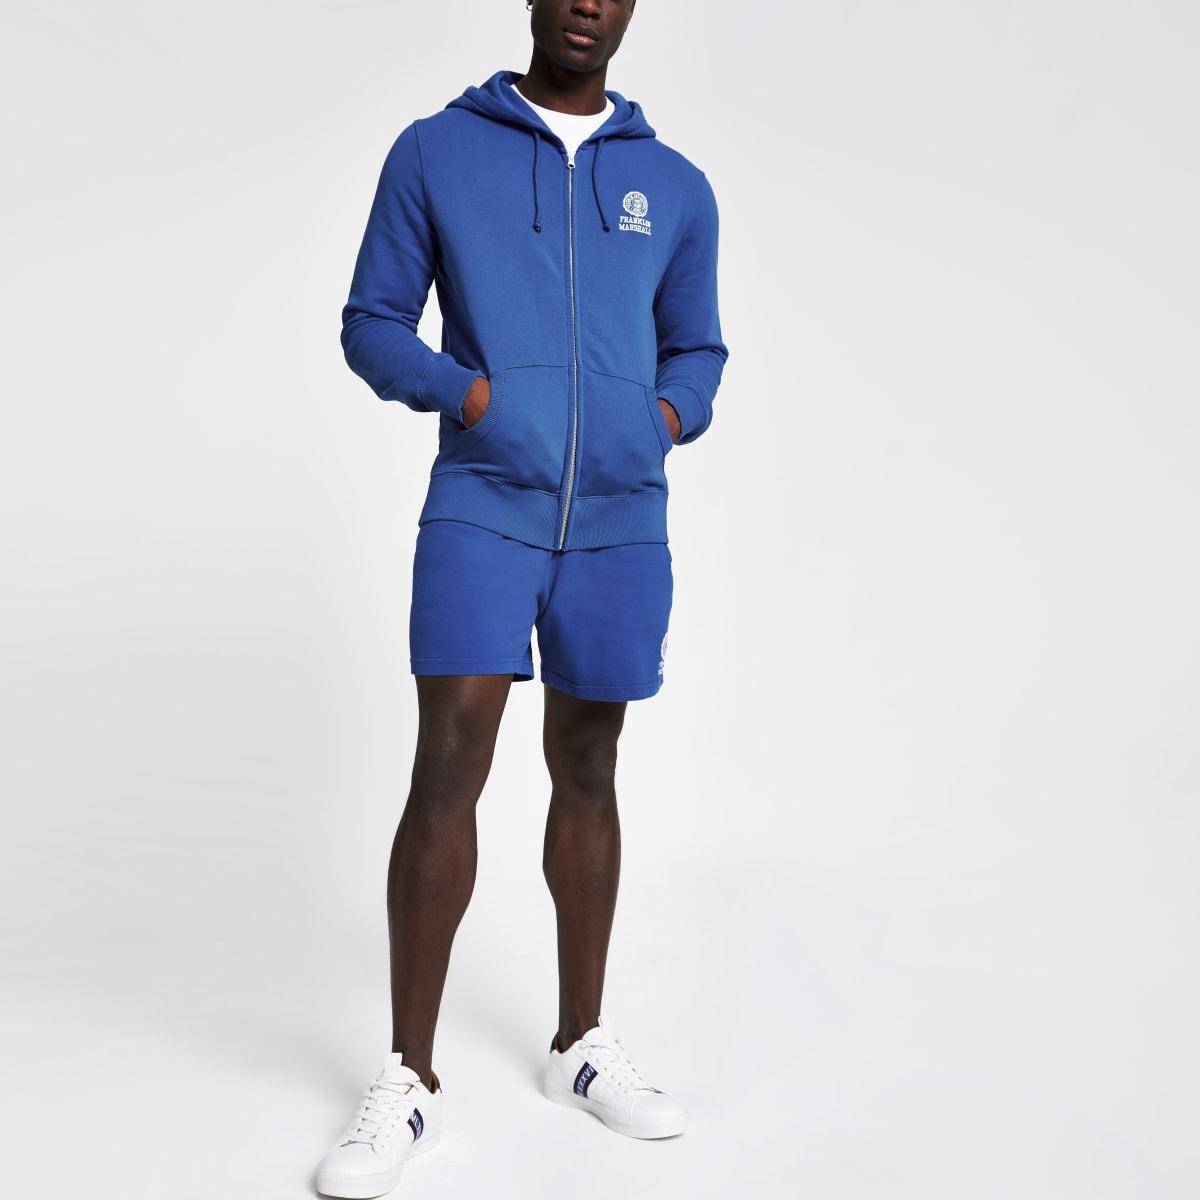 Franklin & Marshall ‒ Sweat bleu zippé à capuche